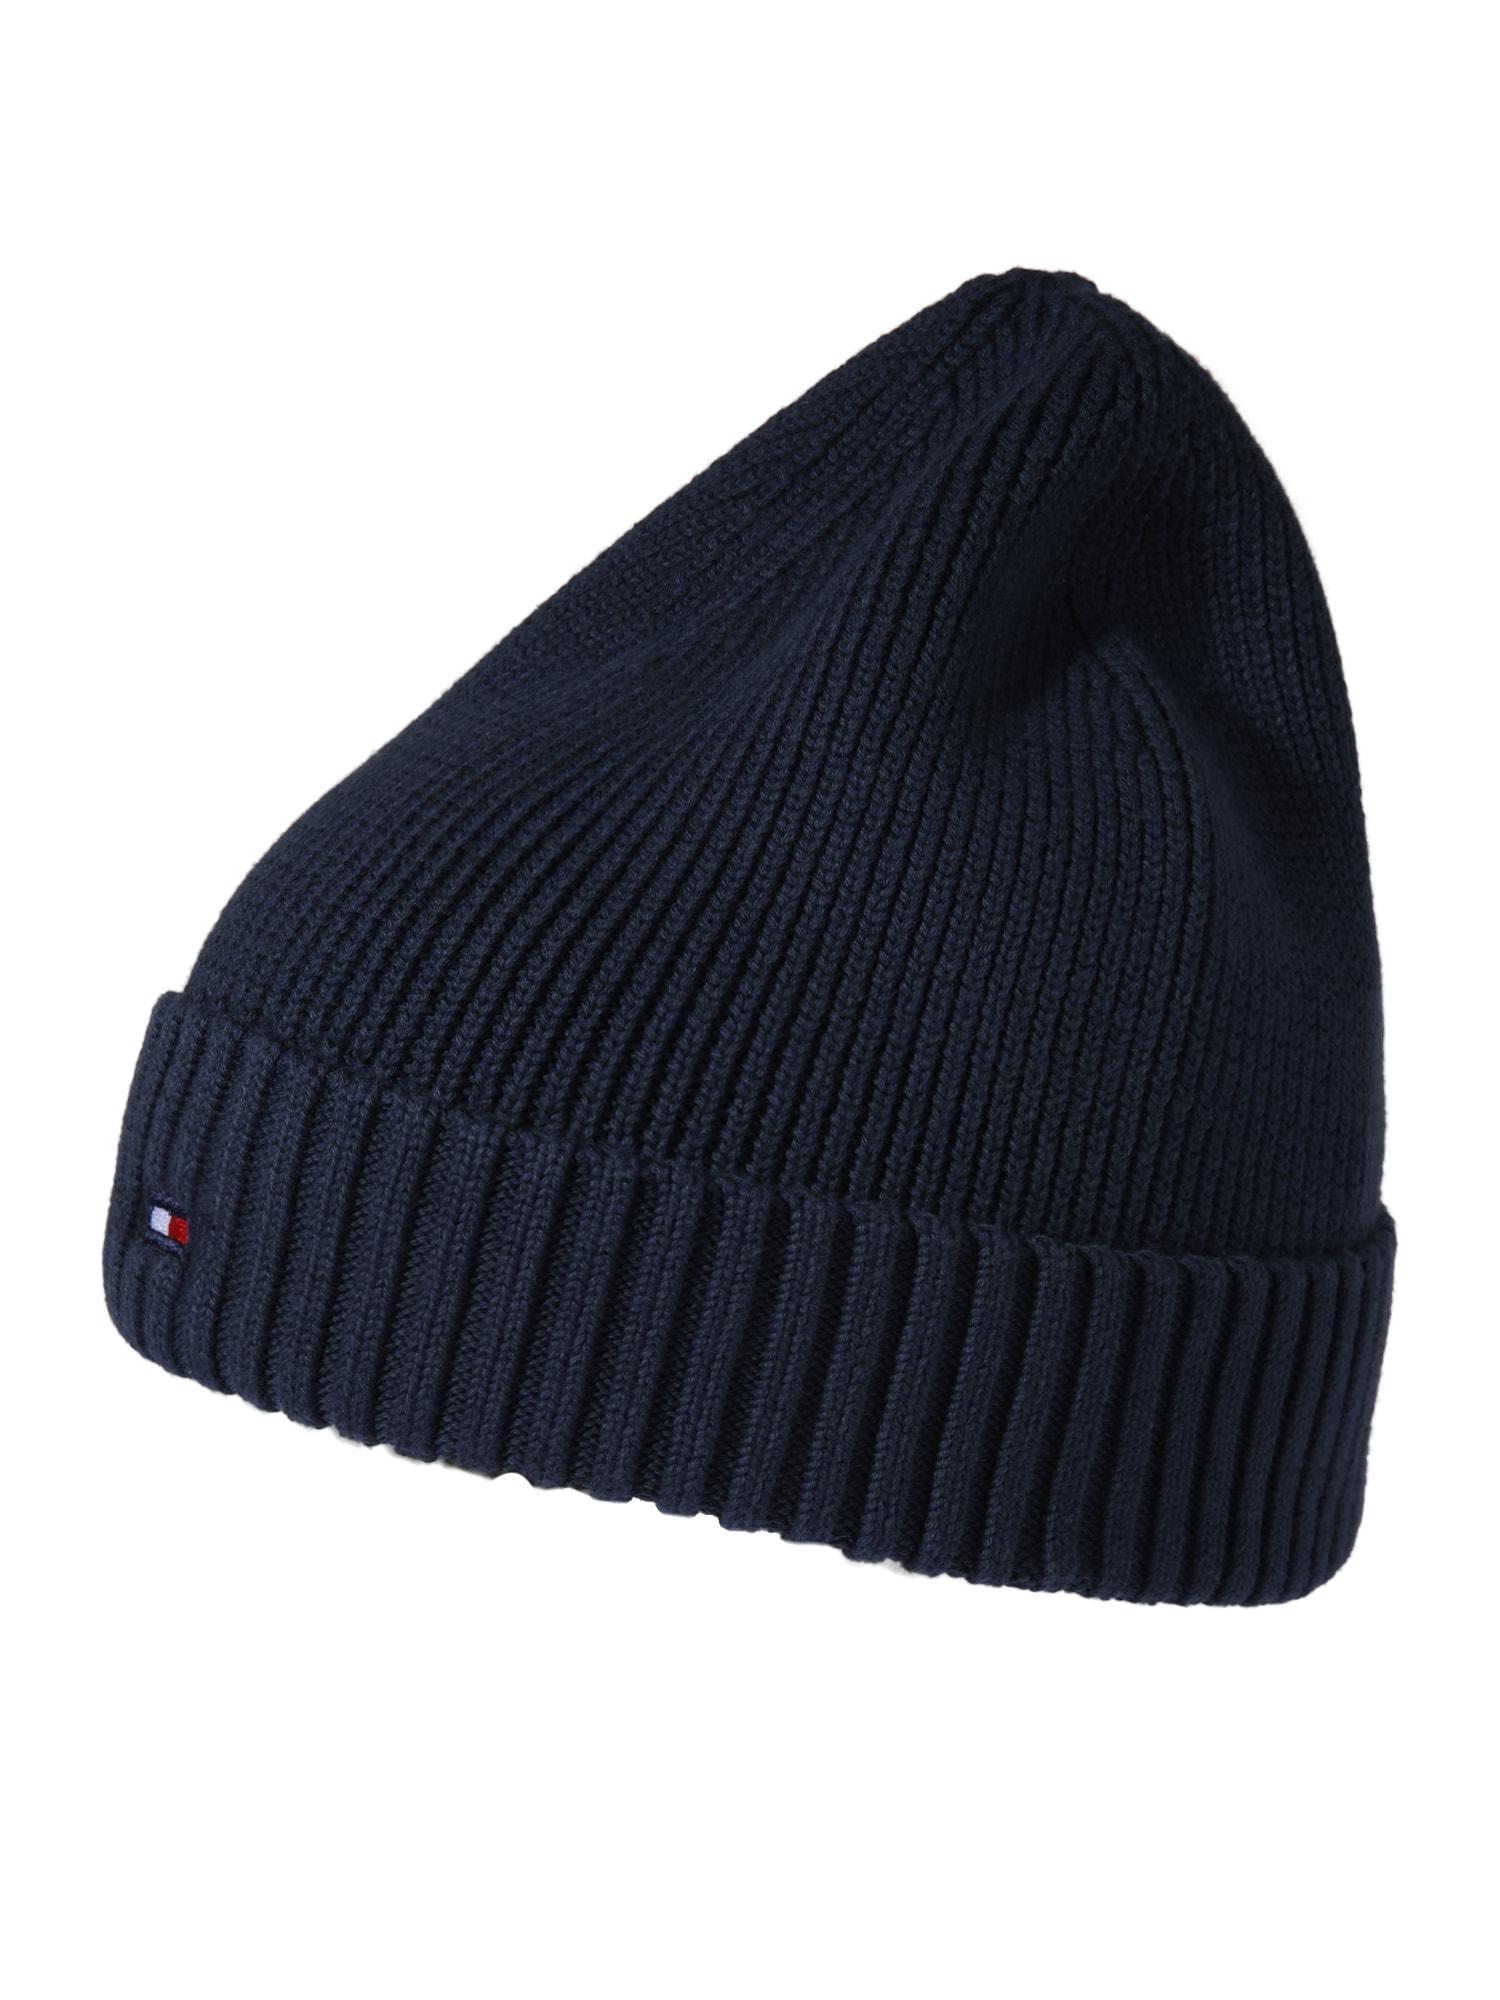 TOMMY HILFIGER Megzta kepurė tamsiai mėlyna / balta / raudona